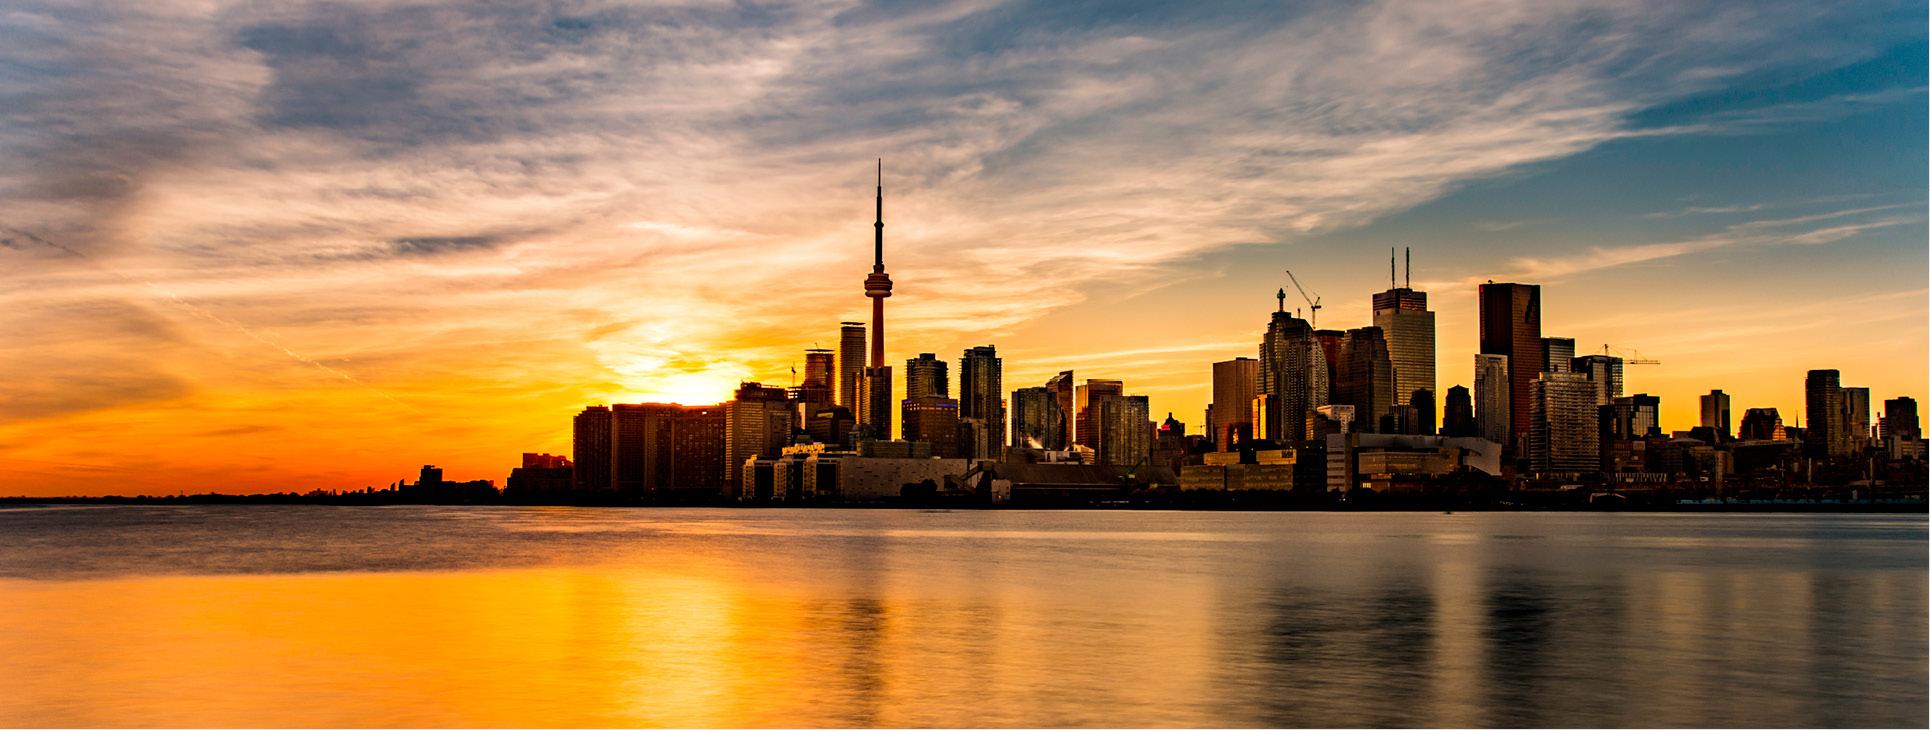 2020 NALP Canadian Winter Meeting